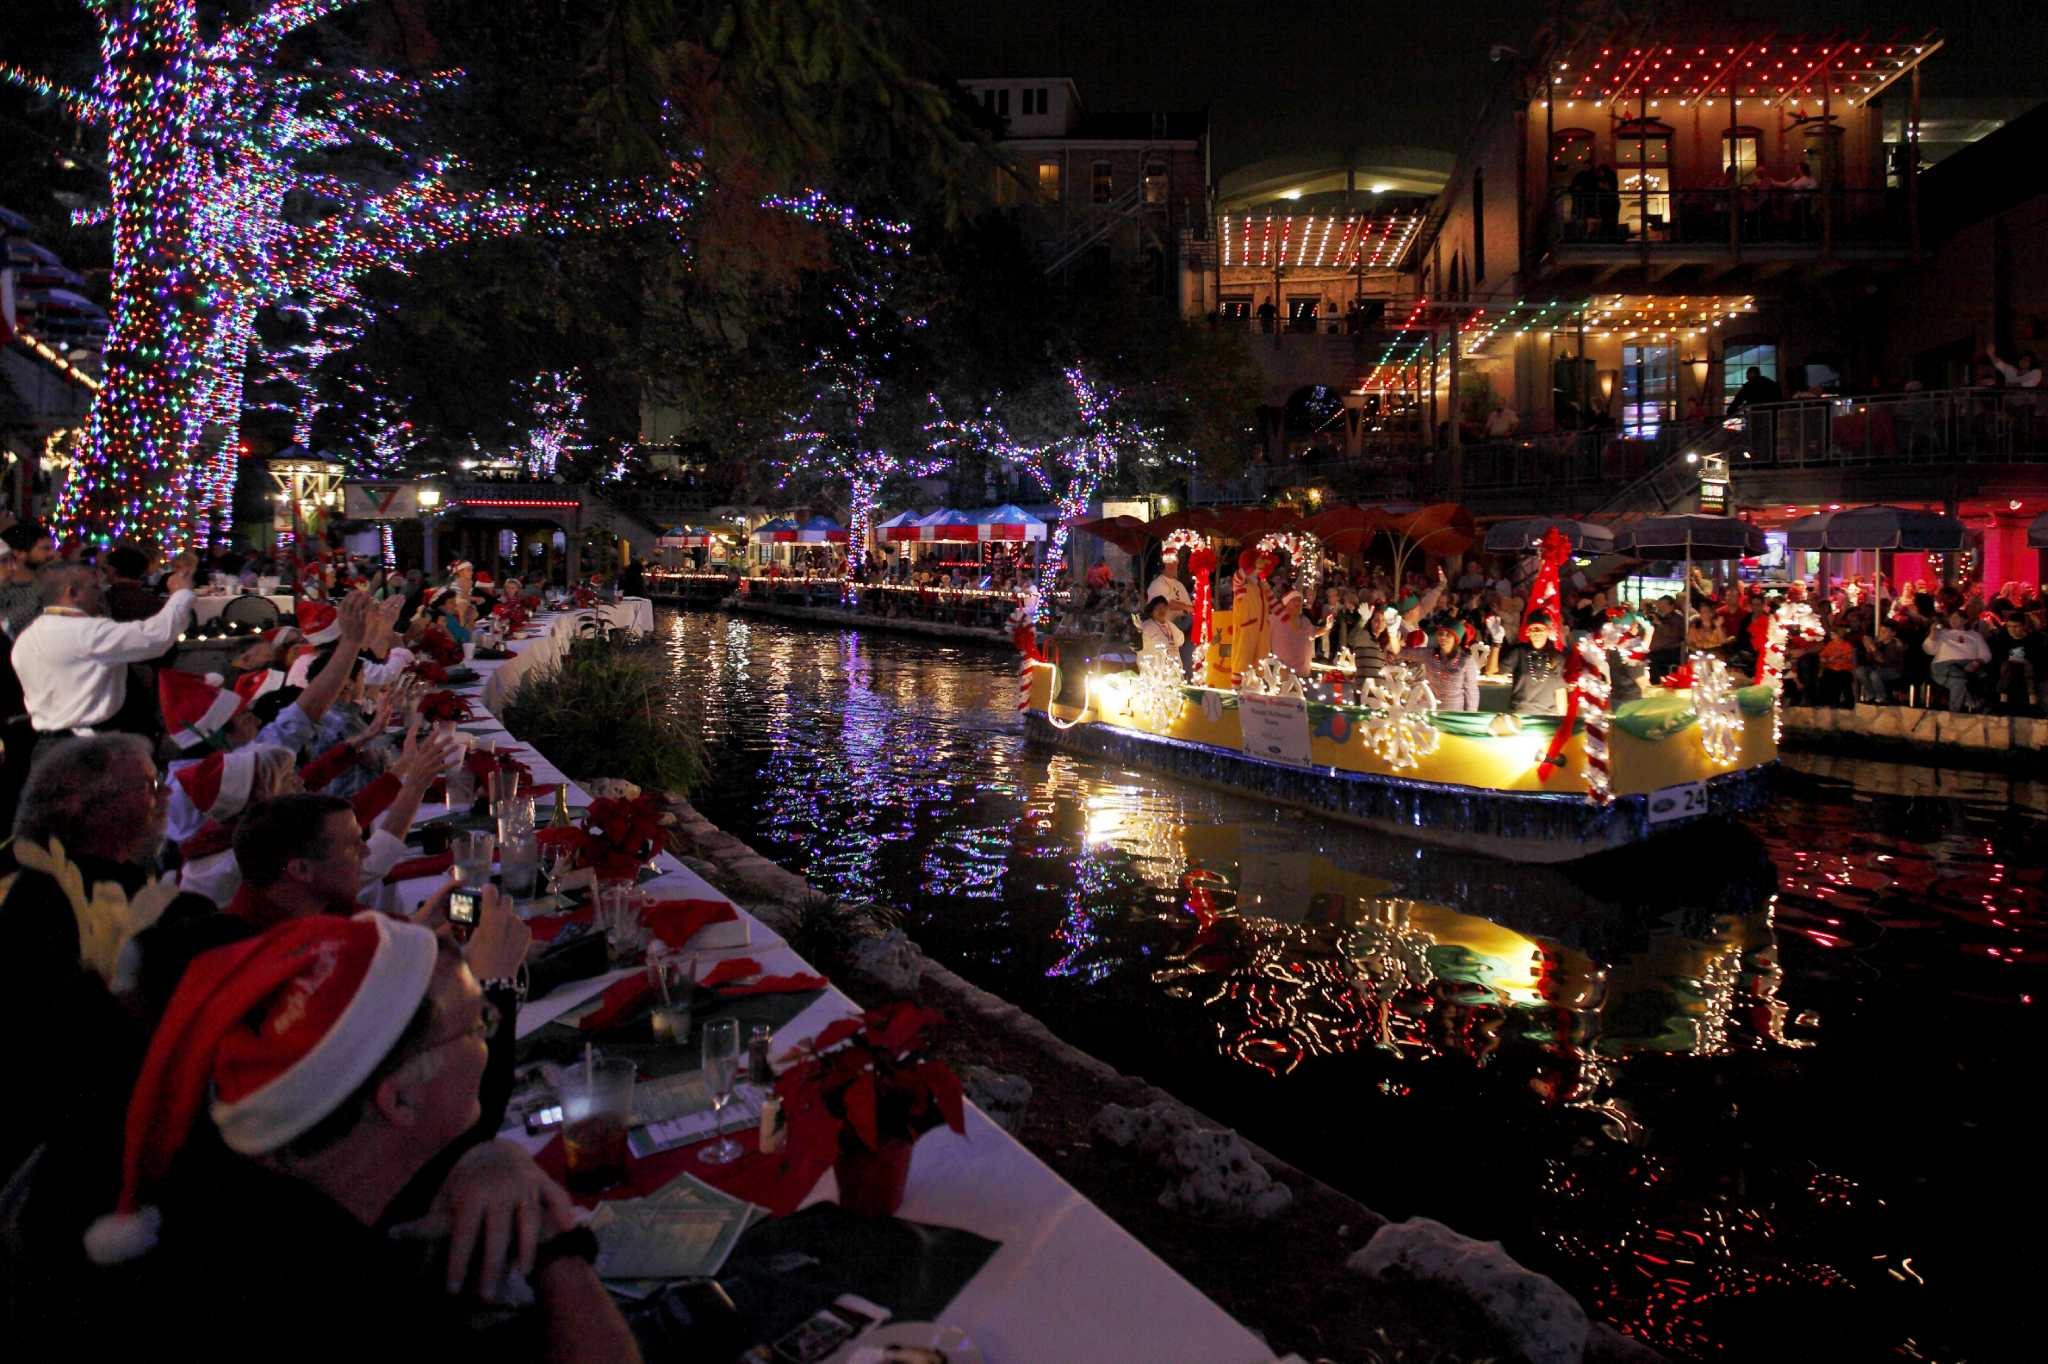 What Is Hov Lane >> Ford Holiday River Parade, a San Antonio tradition - San Antonio Express-News